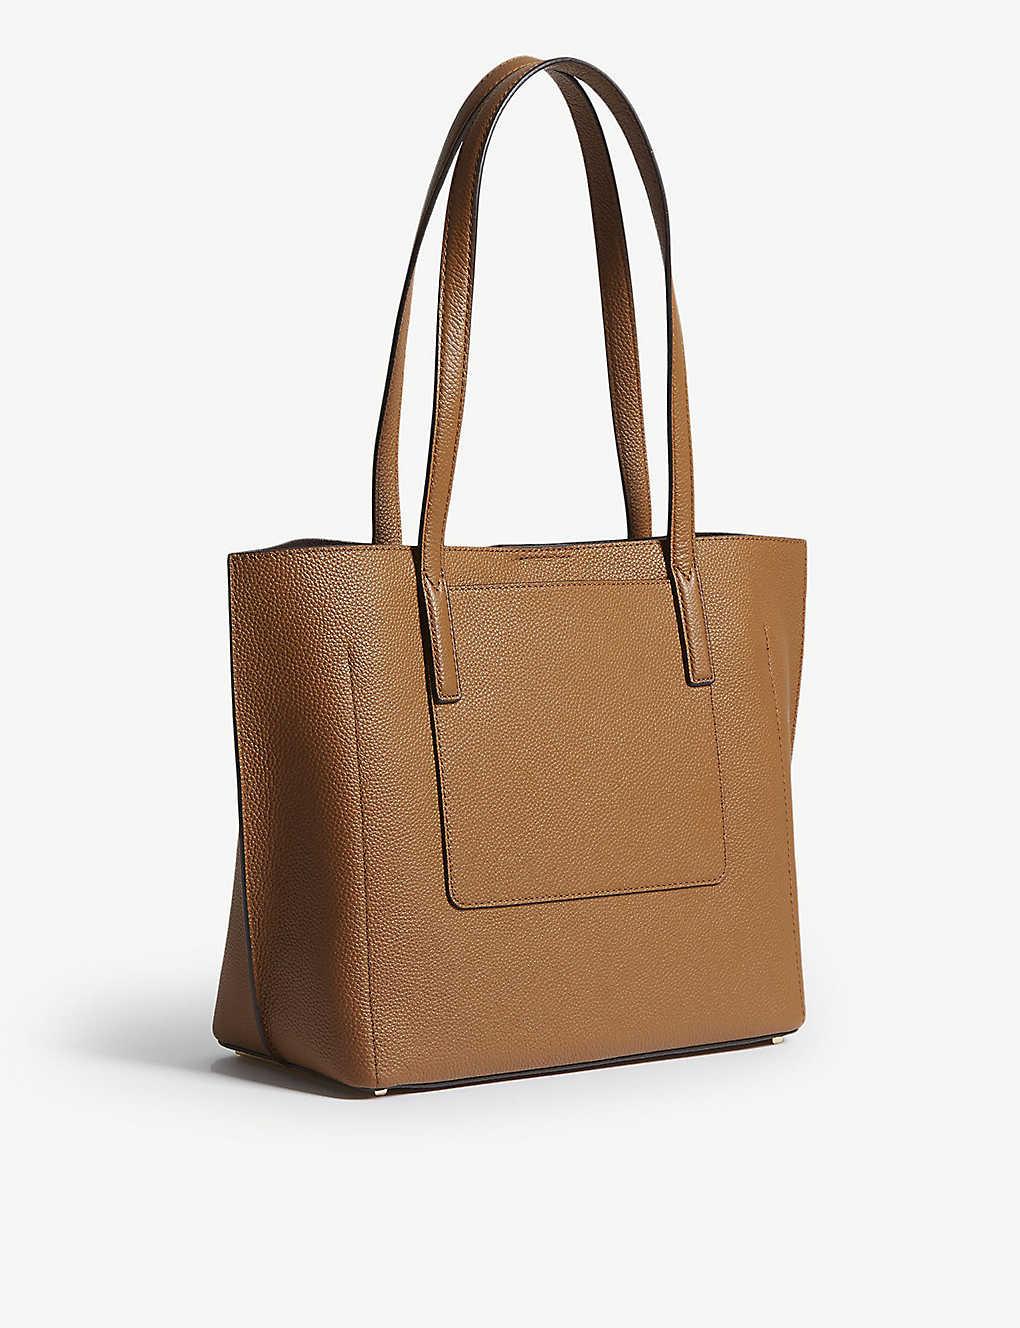 7c579e20c7e4 MICHAEL MICHAEL KORS - Ana bonded medium grained leather tote ...